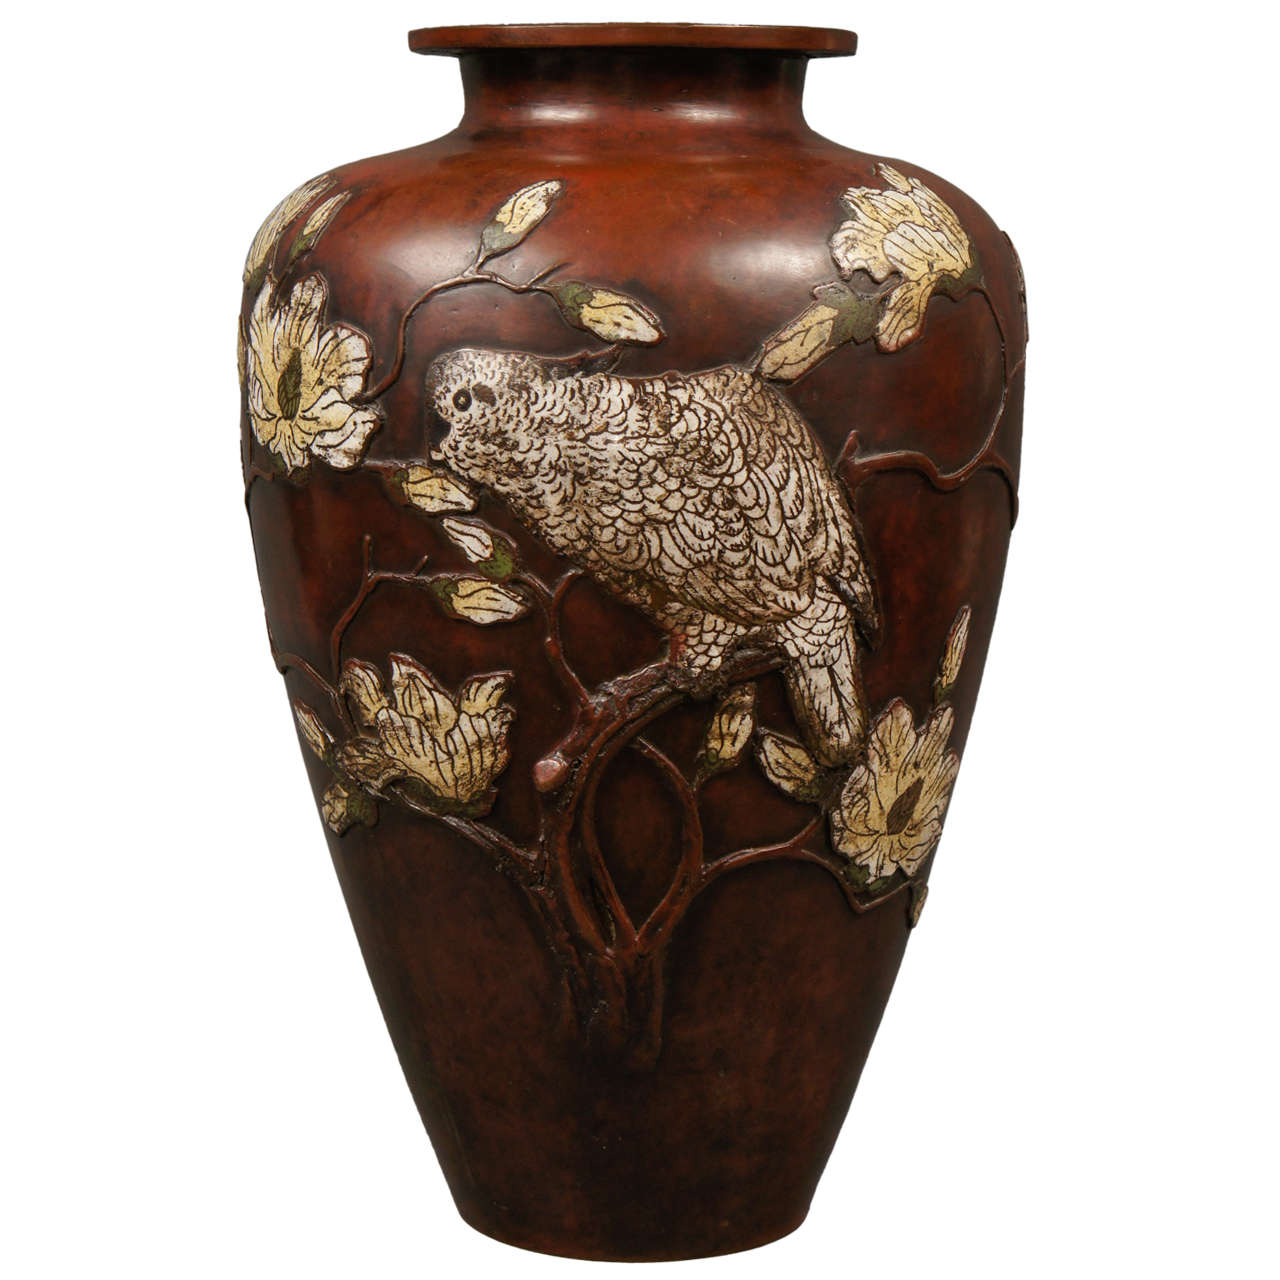 Japanese Bronze Vase For Sale At 1stdibs